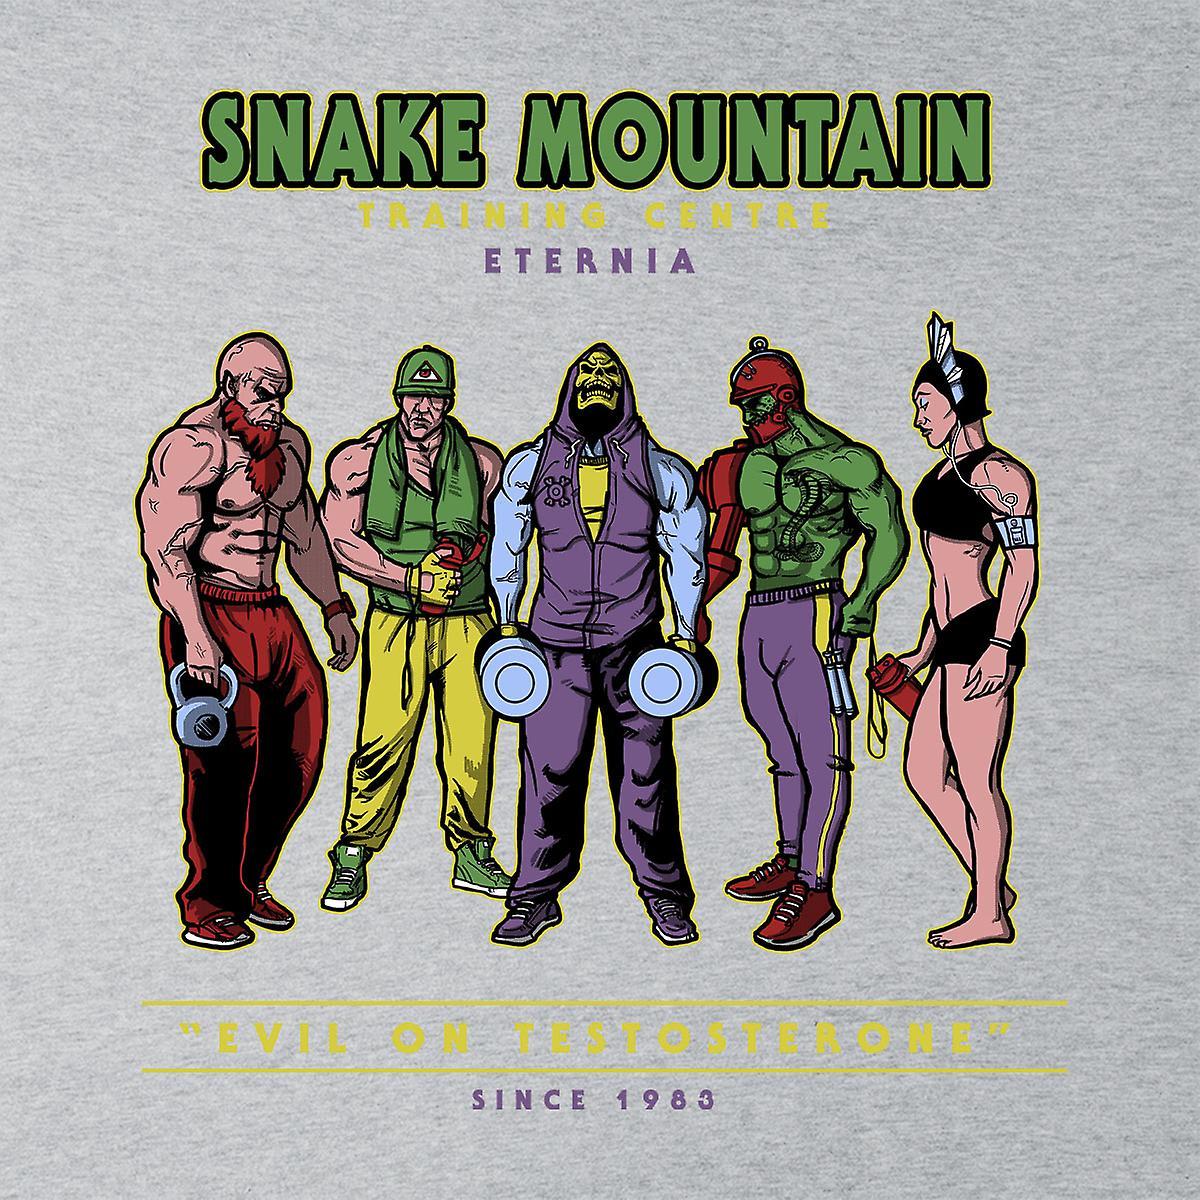 Snake Mountain uddannelse center Eternia Skeletor børne T-Shirt